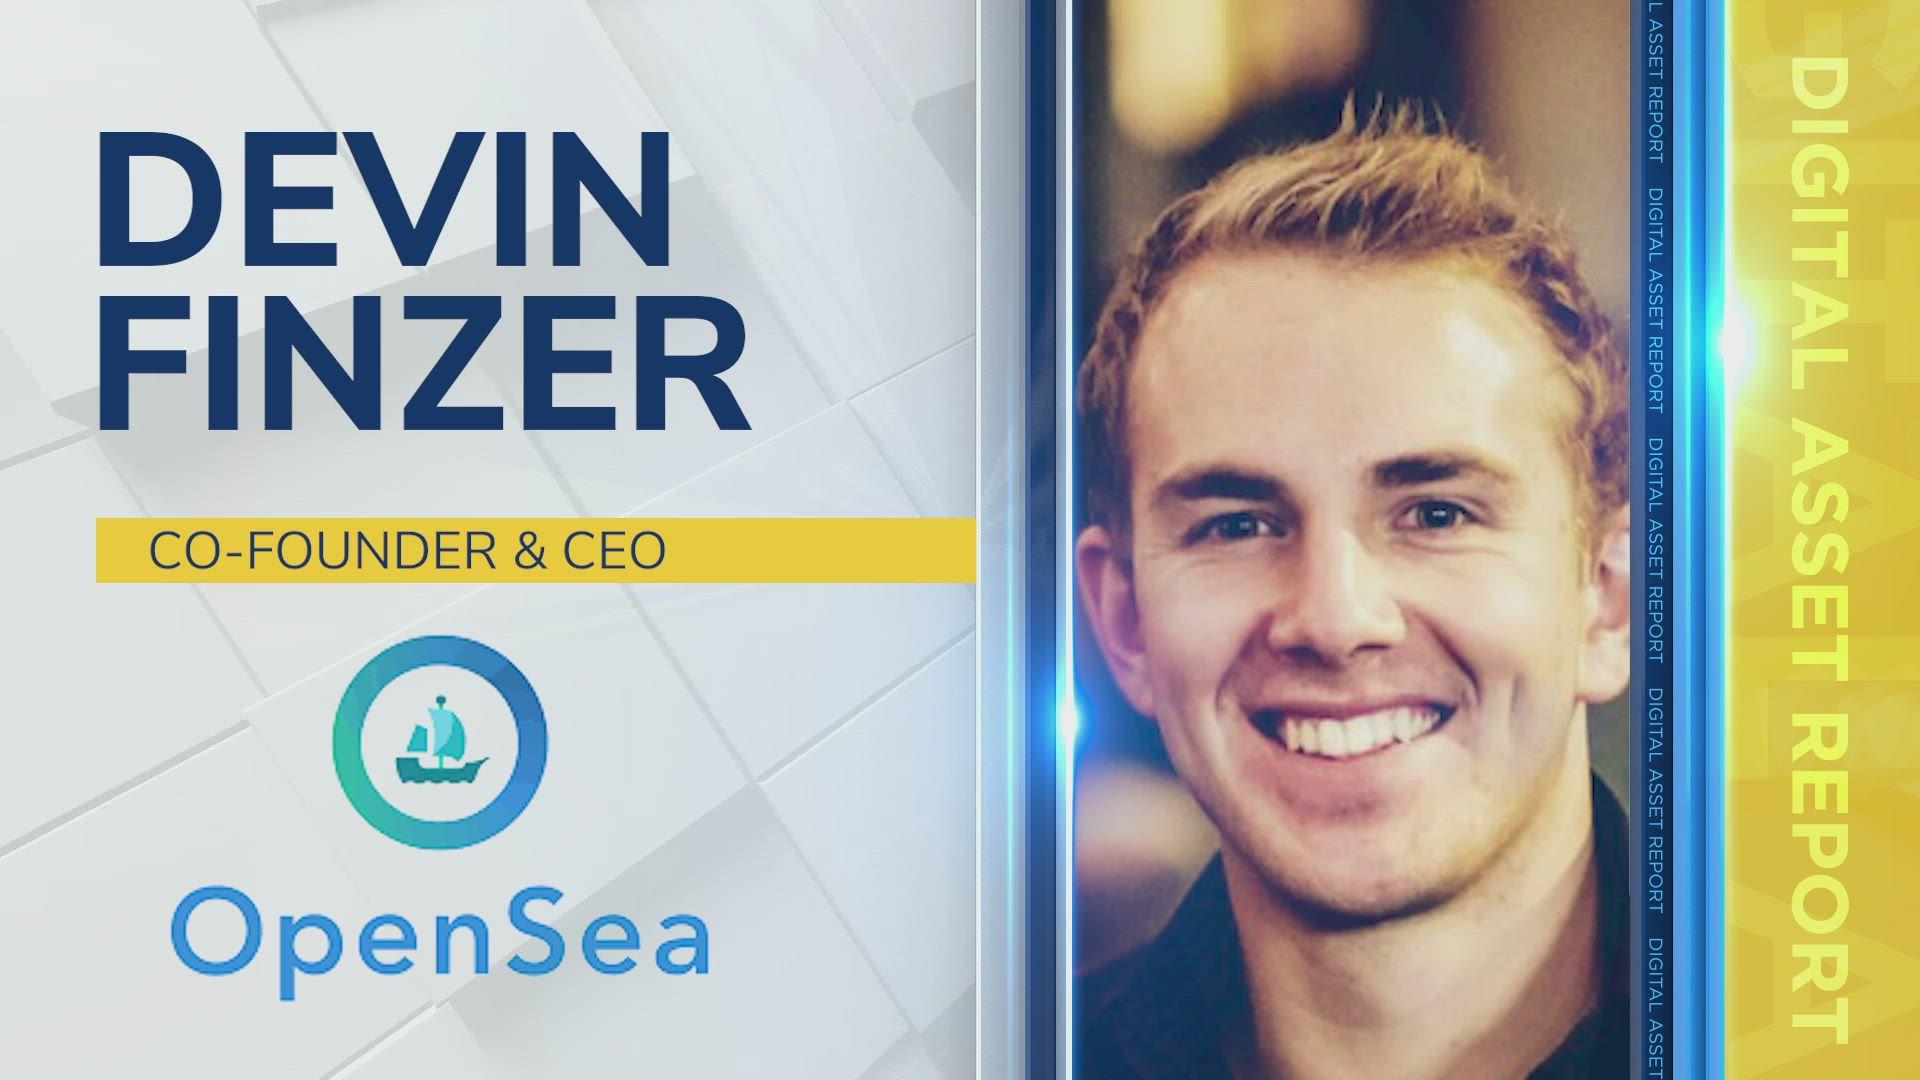 Devin Finzer, Co-founder & CEO at OpenSea